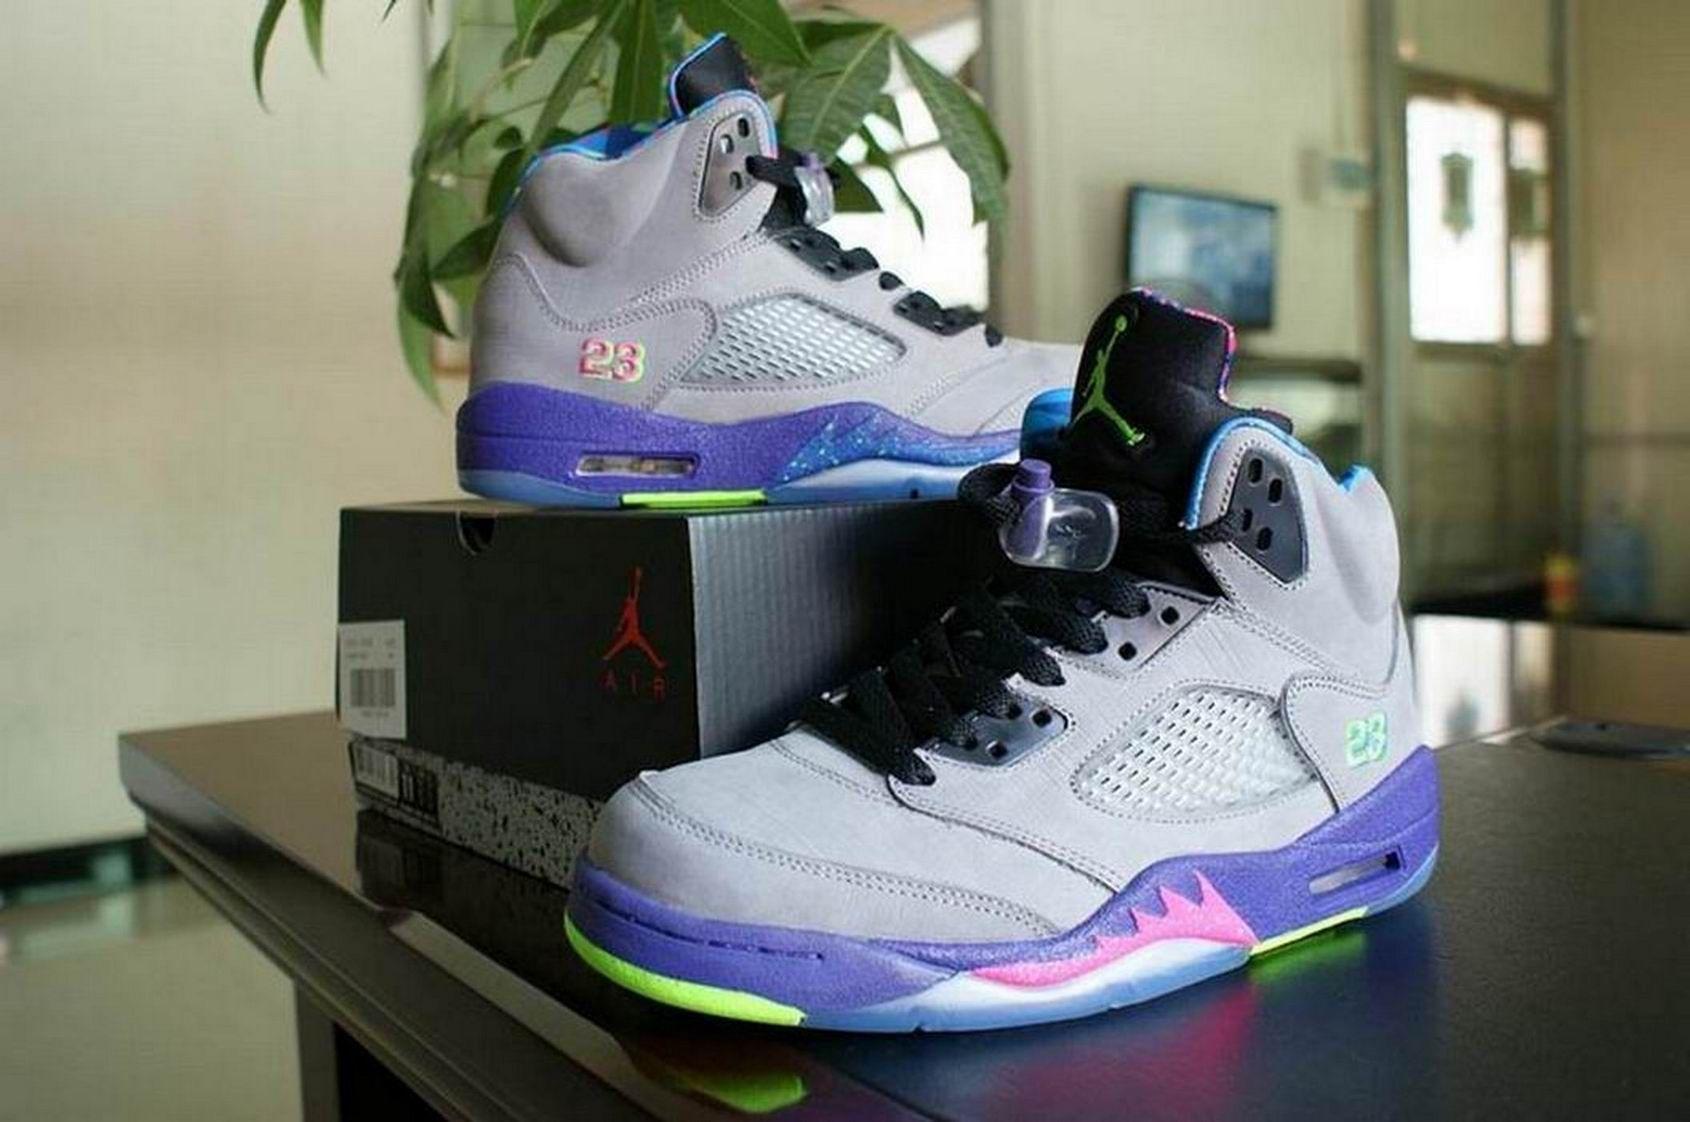 hot sale online 79c87 85f98 hot air jordan retro 5 bel air grey purple green 6cf51 20650  clearance  jordan shoes 2014 9a203 0e1df